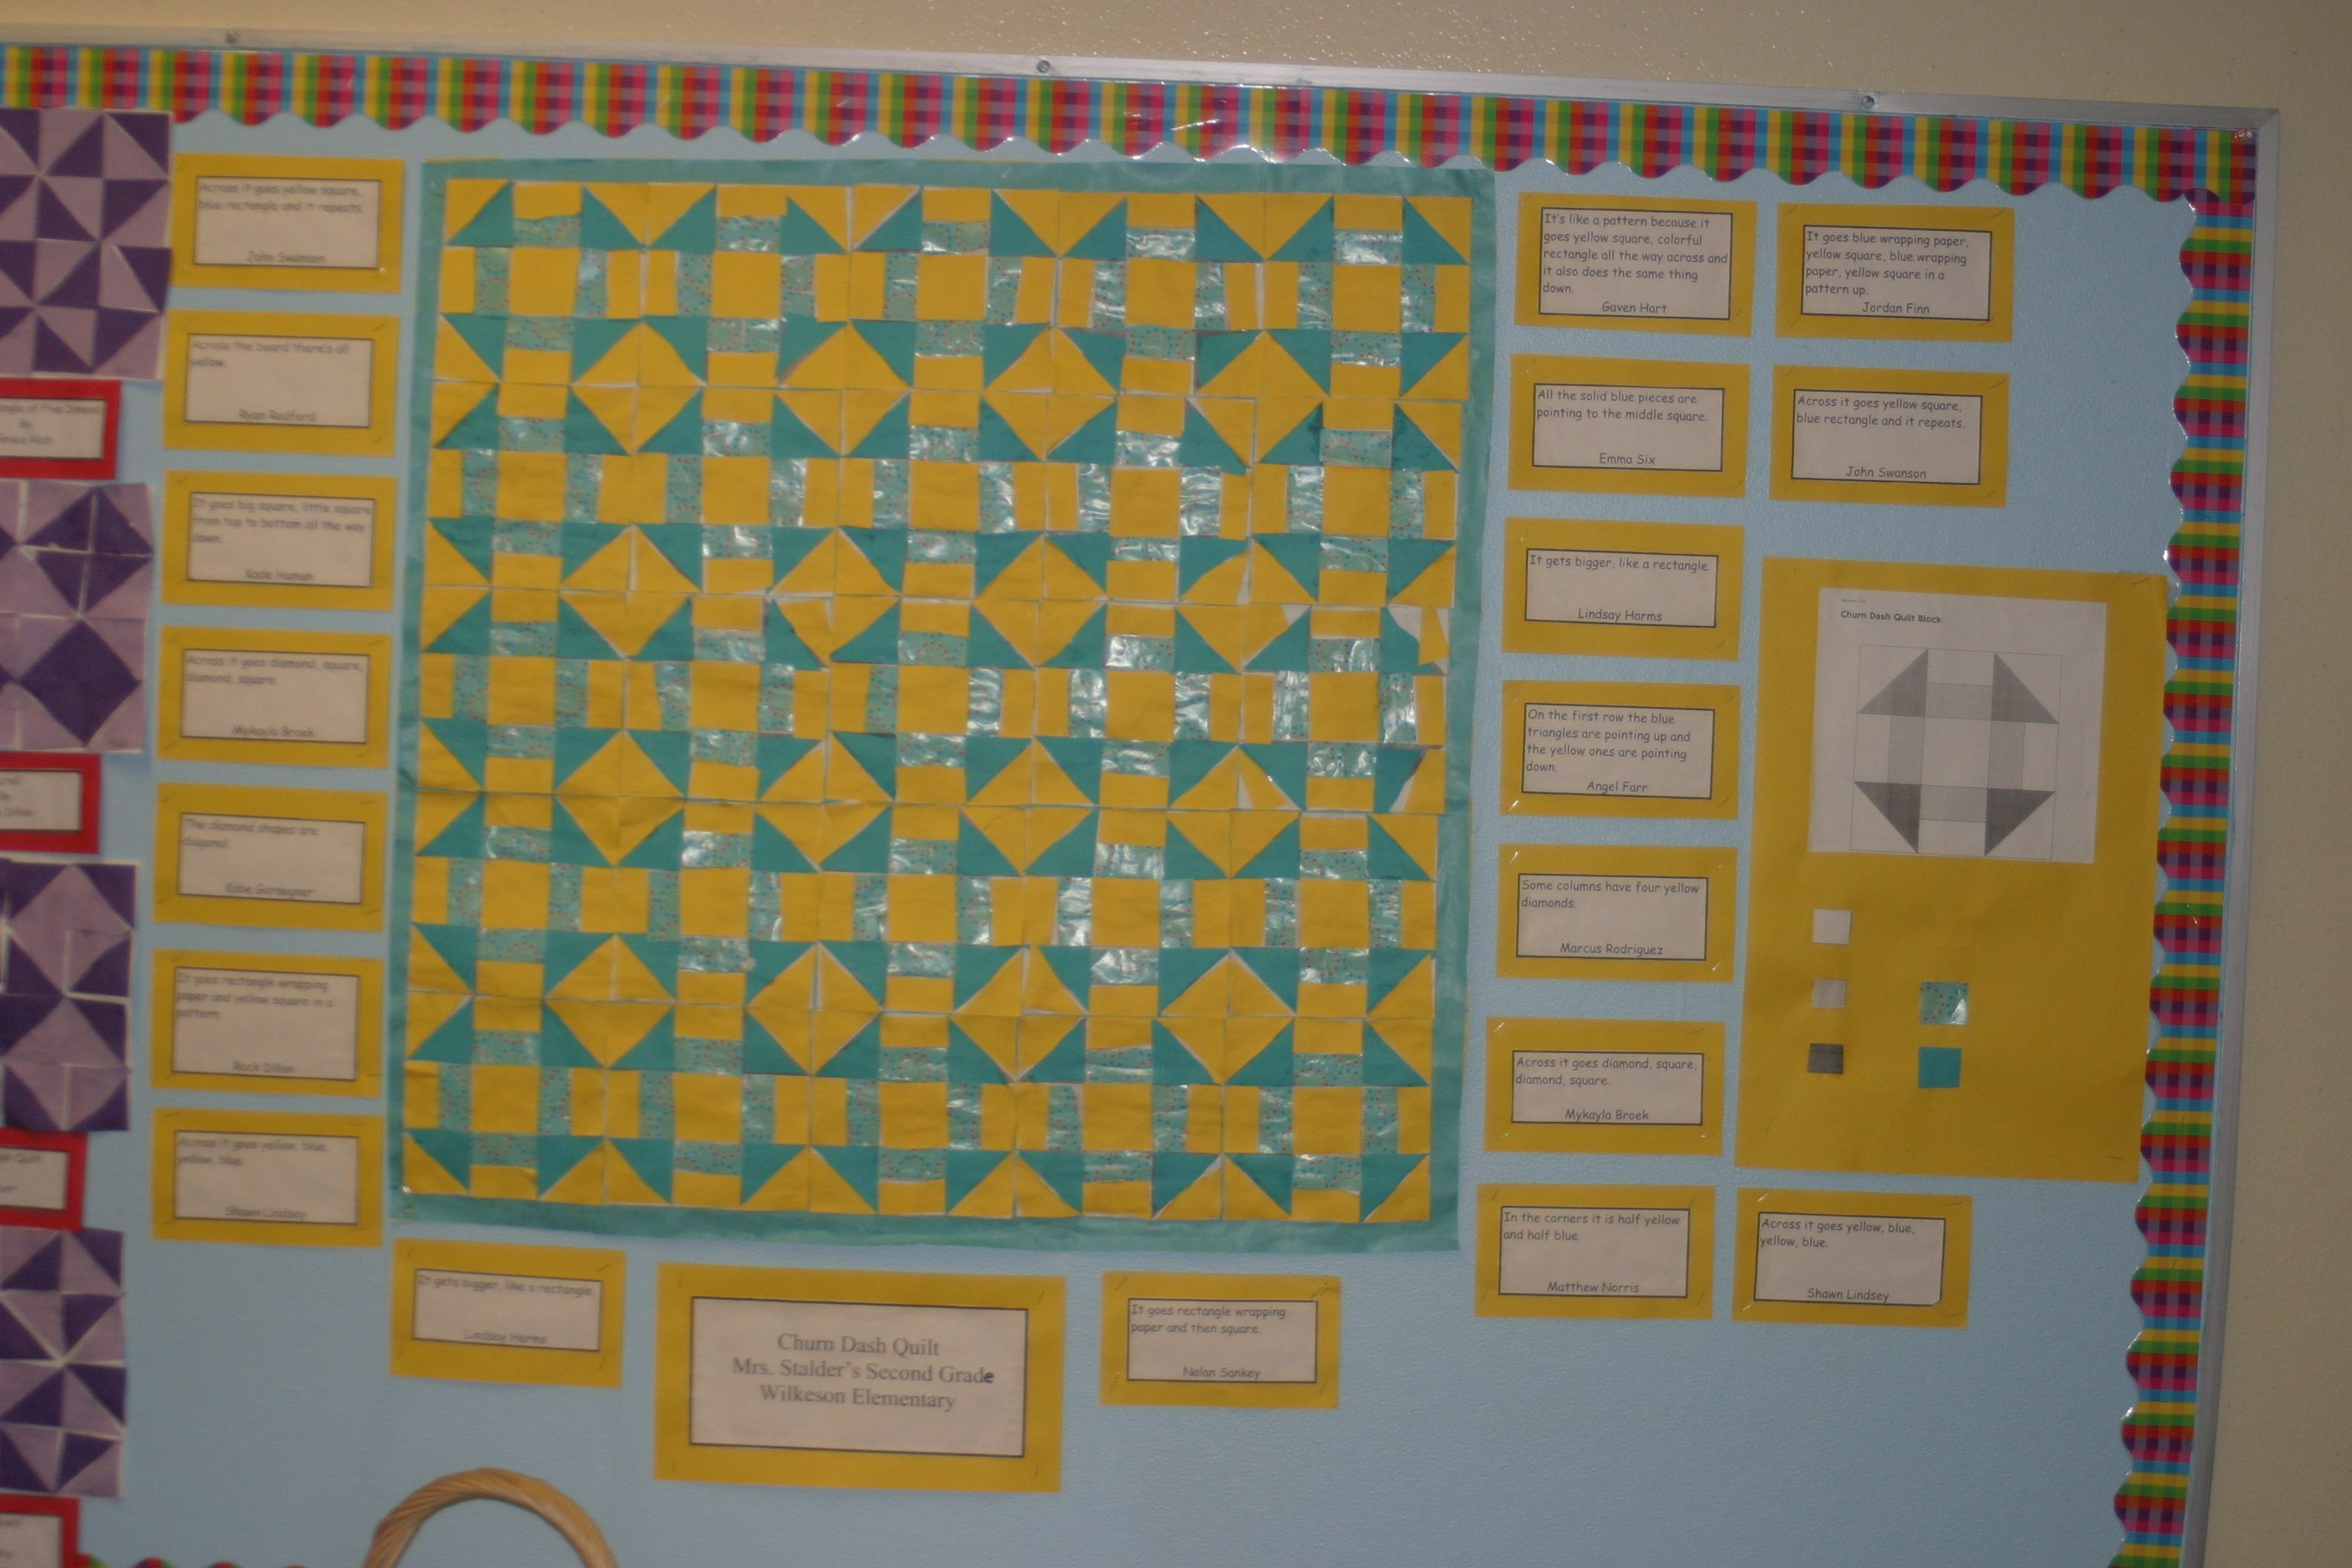 Bridges Math 2nd Grade Paper Quilt Built By Kids With